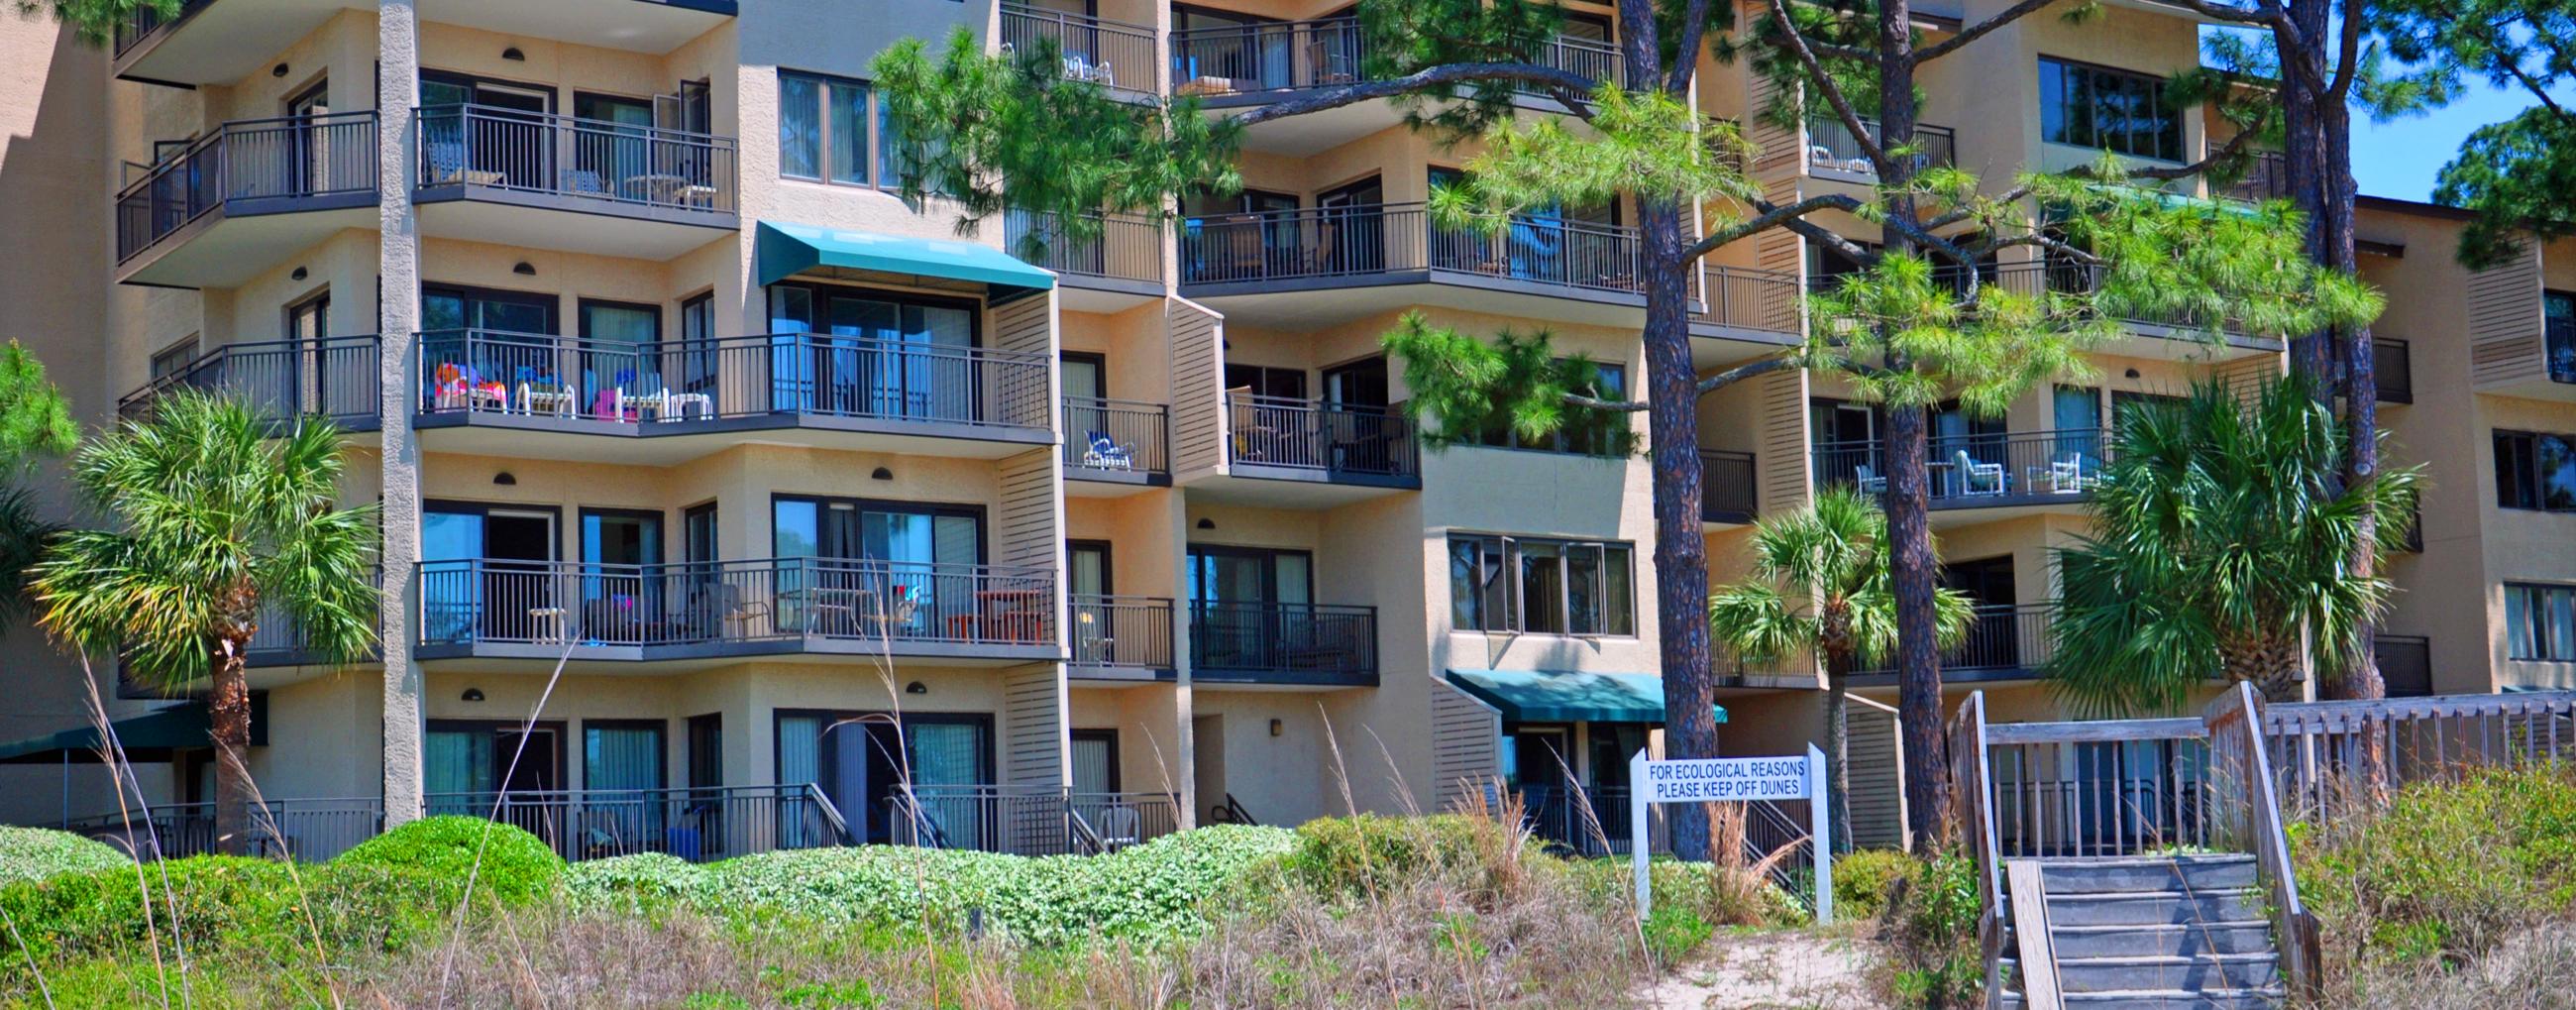 Beachside Tennis Villas Hilton Head